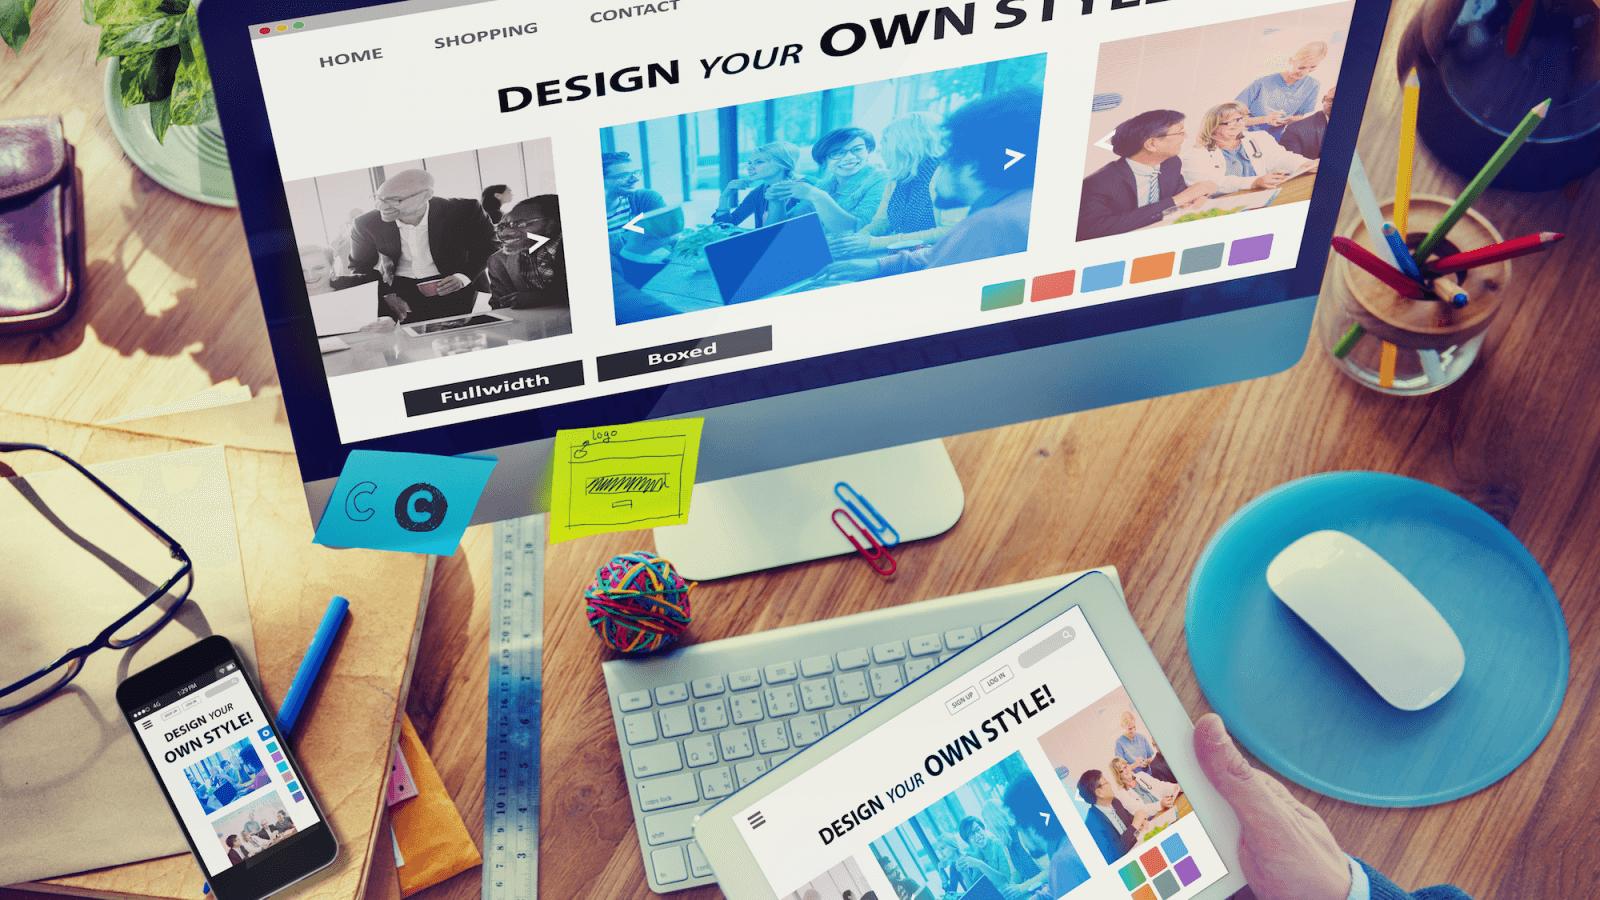 Web Design Consultant Gloucester With Images Web Development Design